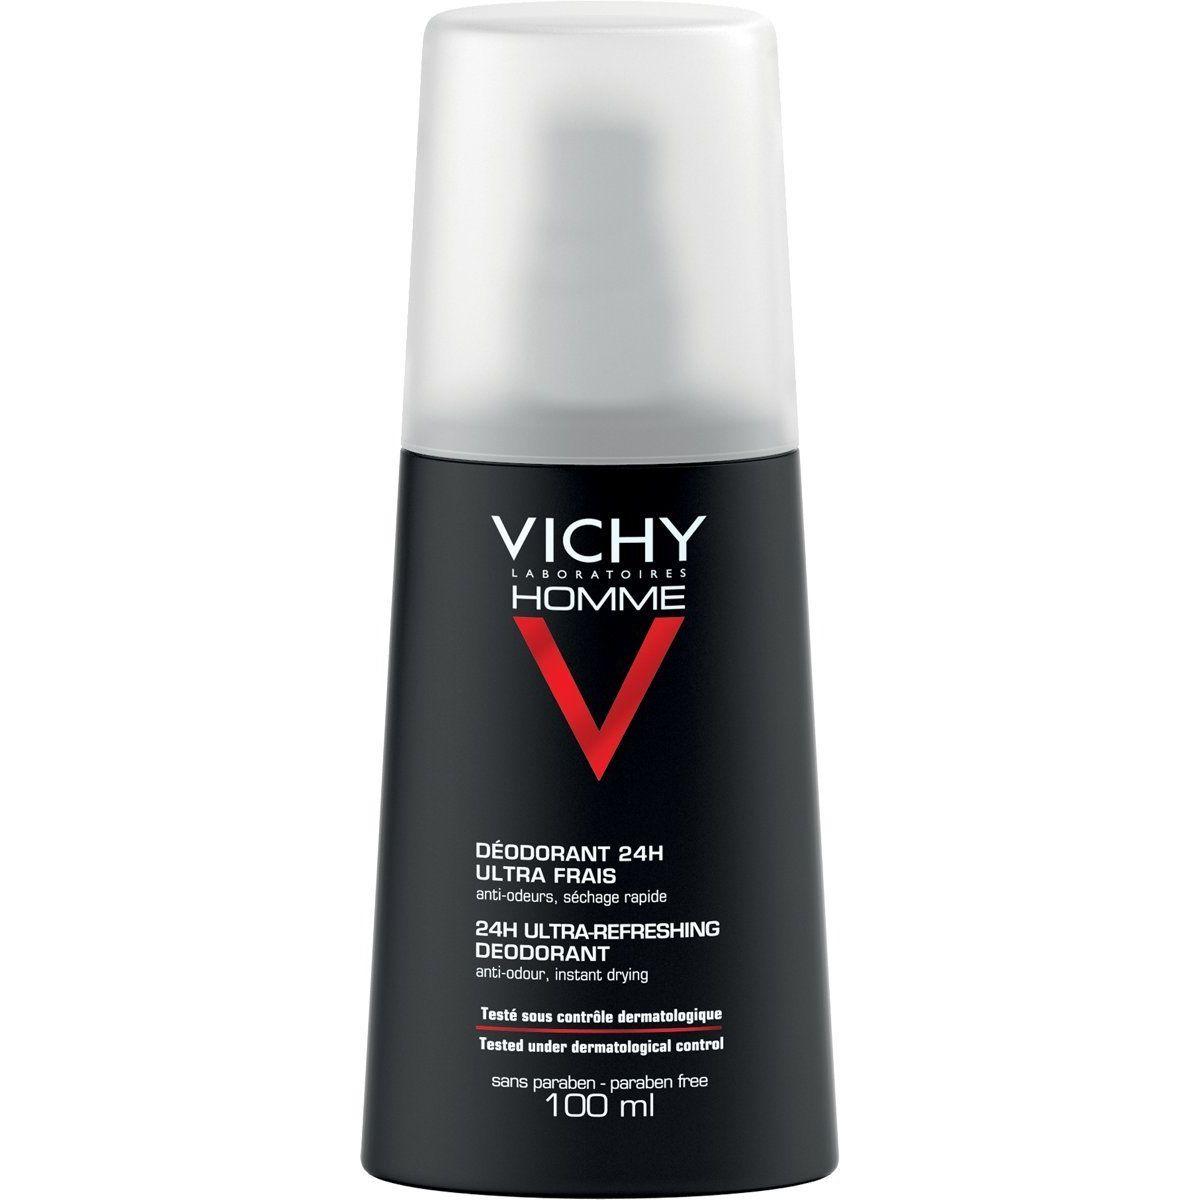 Homme Deodorante ultra fresco 24H di Vichy Deodorante Uomo  Flacone spray 100 ml